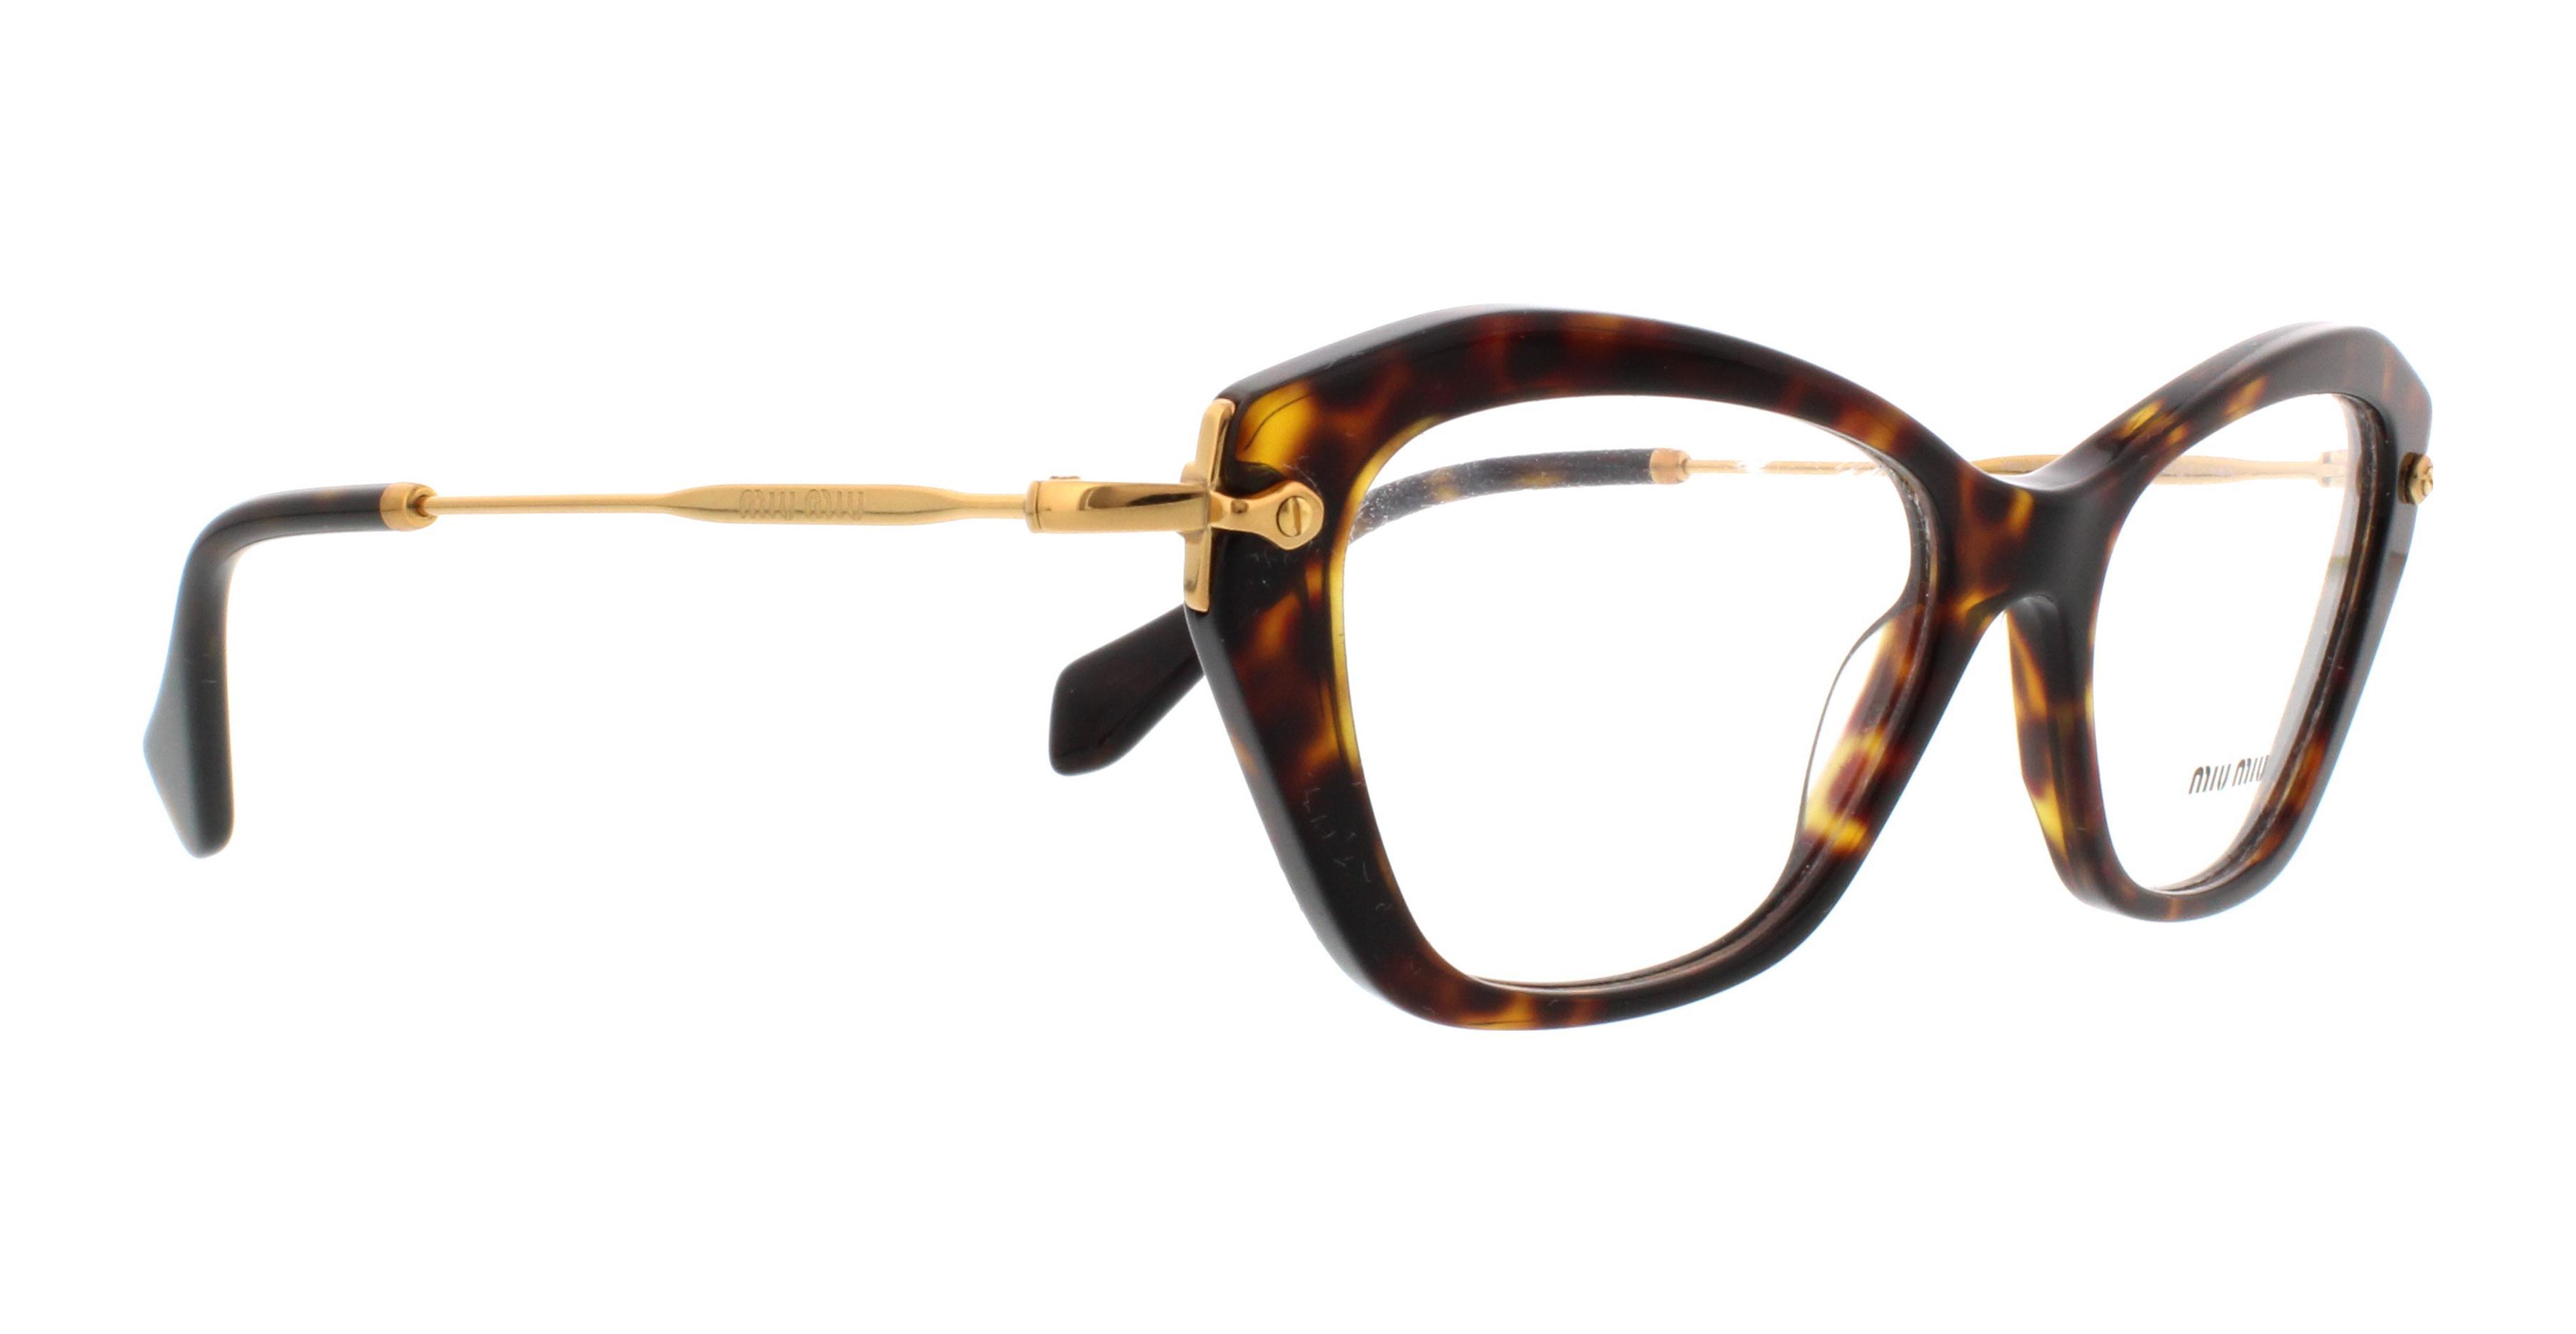 MIU MIU Eyeglasses MU04LV 2AU1O1 Havana 52MM | eBay